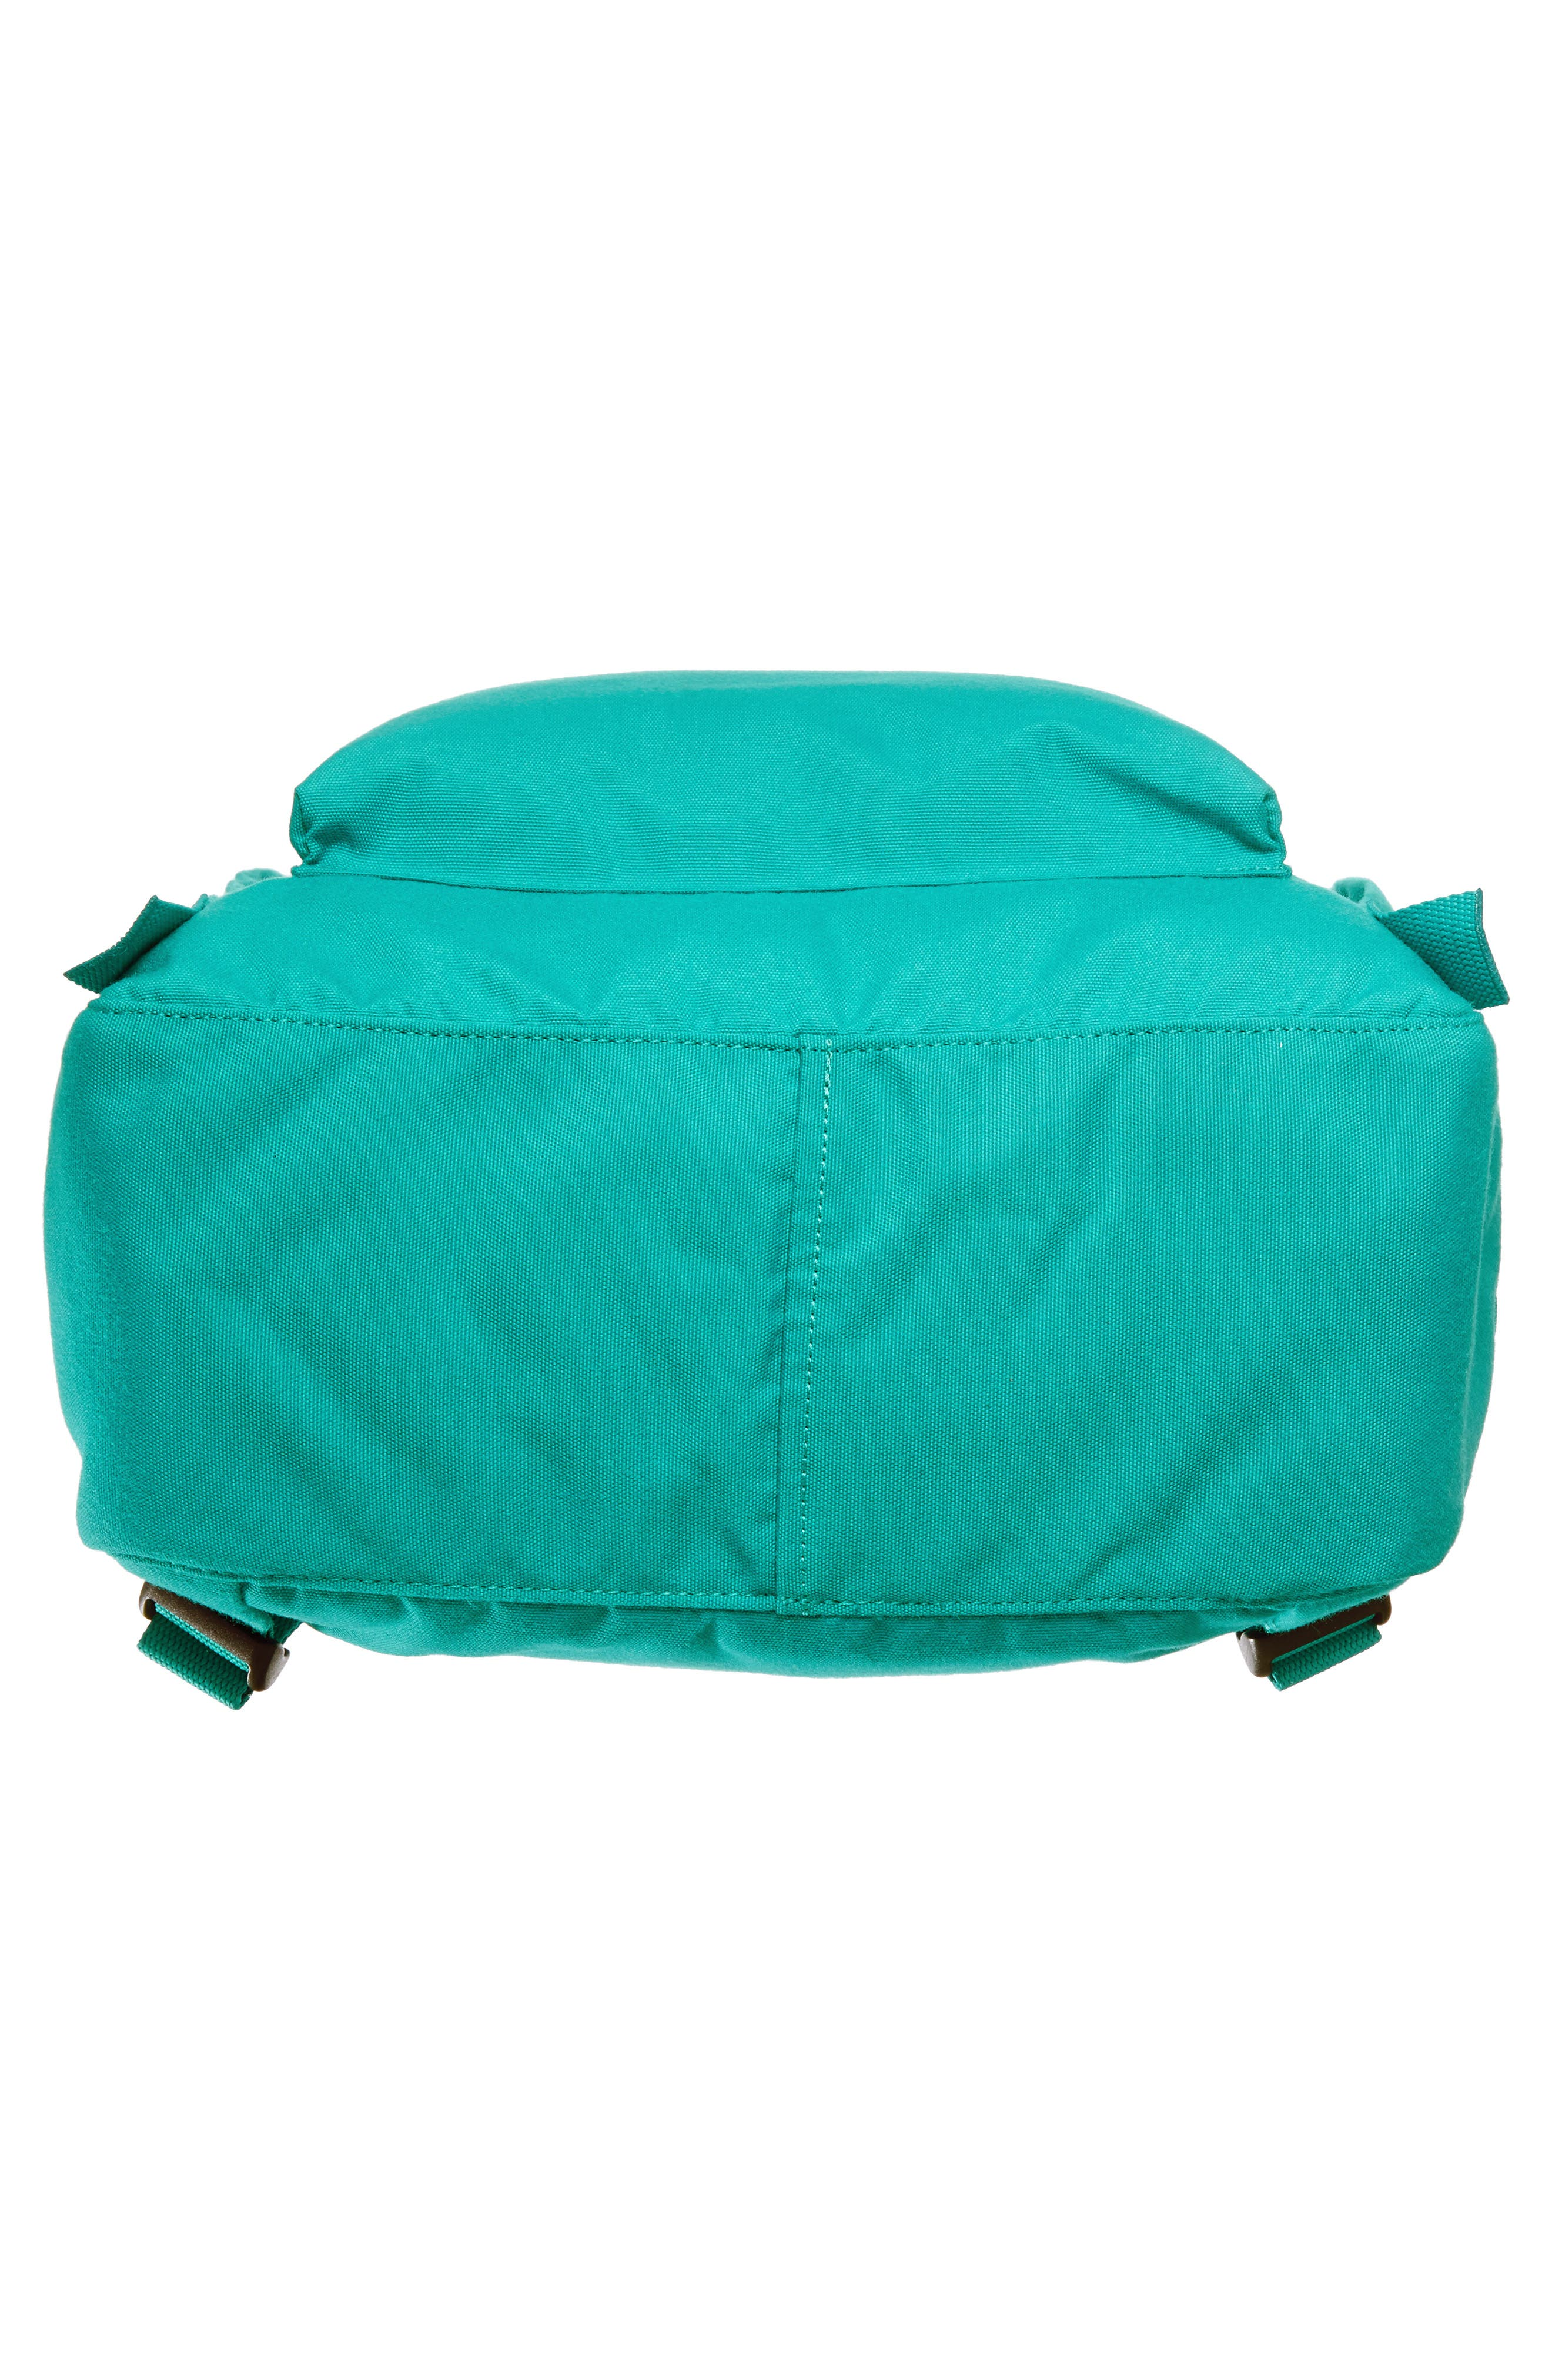 Re-Kånken Water Resistant Backpack,                             Alternate thumbnail 6, color,                             EMERALD